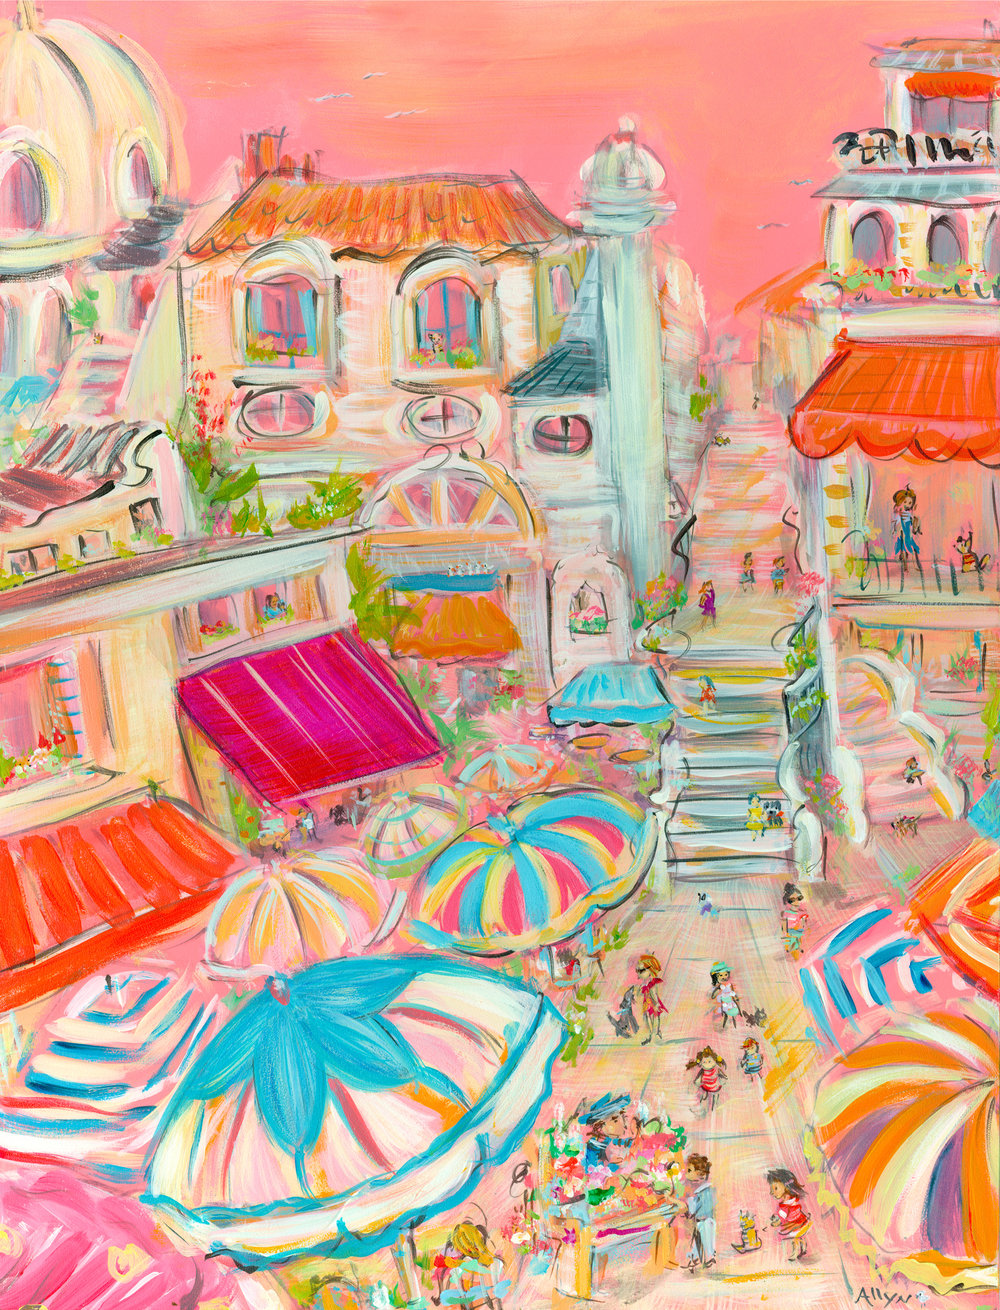 Allyn_Howard_holiday_umbrellas_painting.jpg